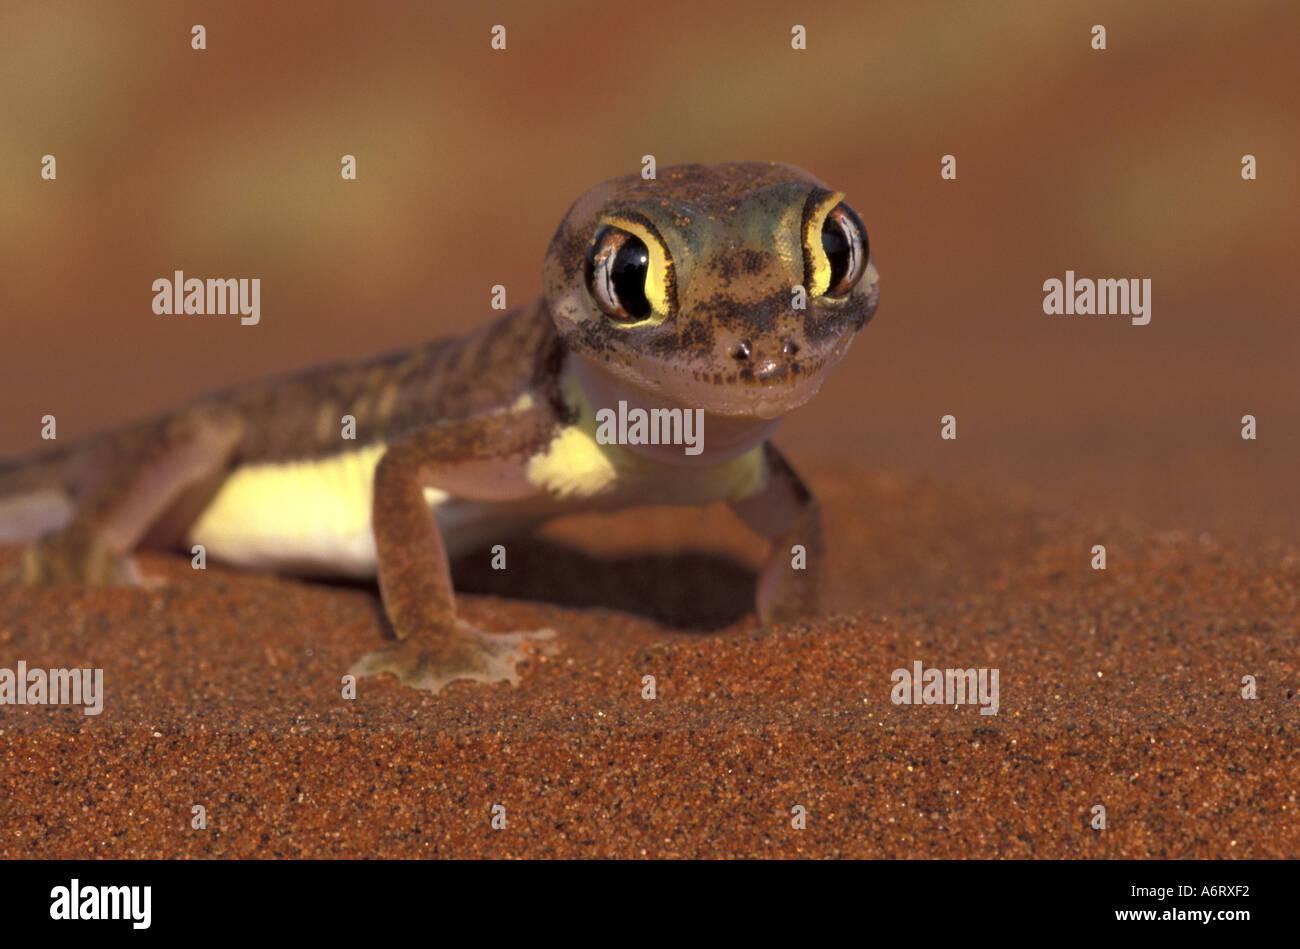 Africa, Namibia, Namib National Park. Web-footed Gecko (Palmatogecko rangei) Stock Photo